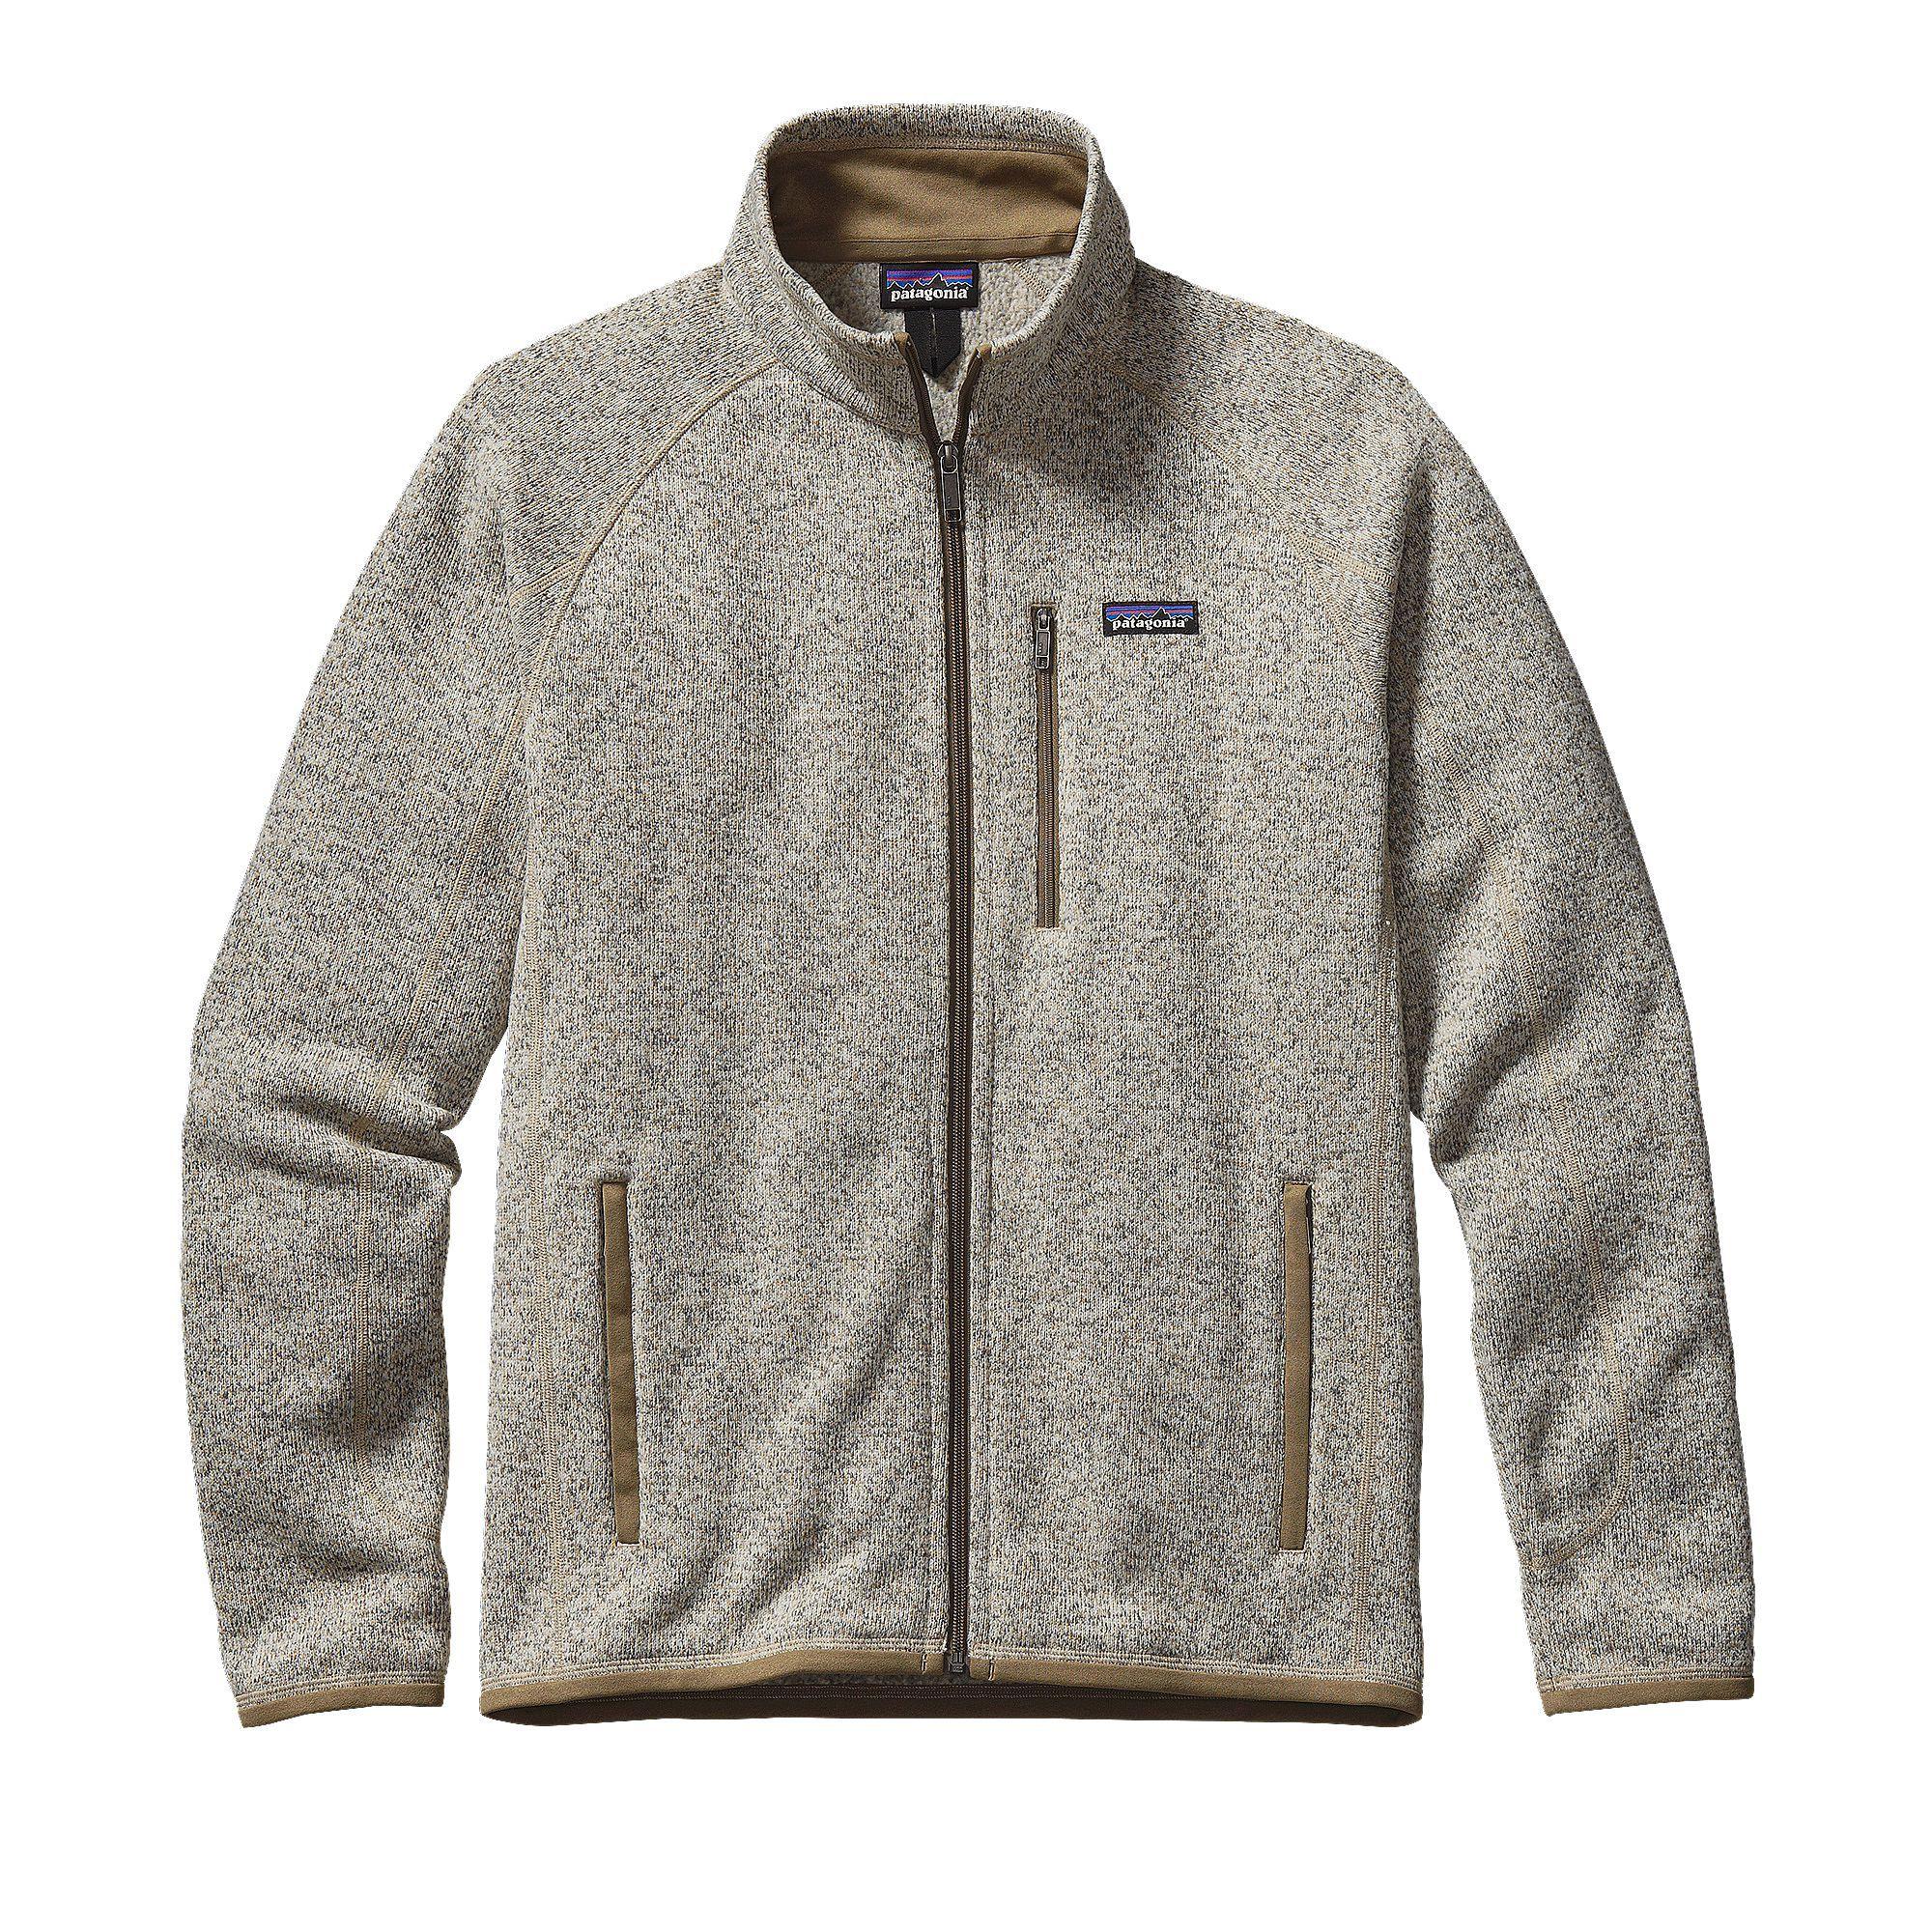 Men's Better Sweater® Fleece Jacket | Patagonia better ...